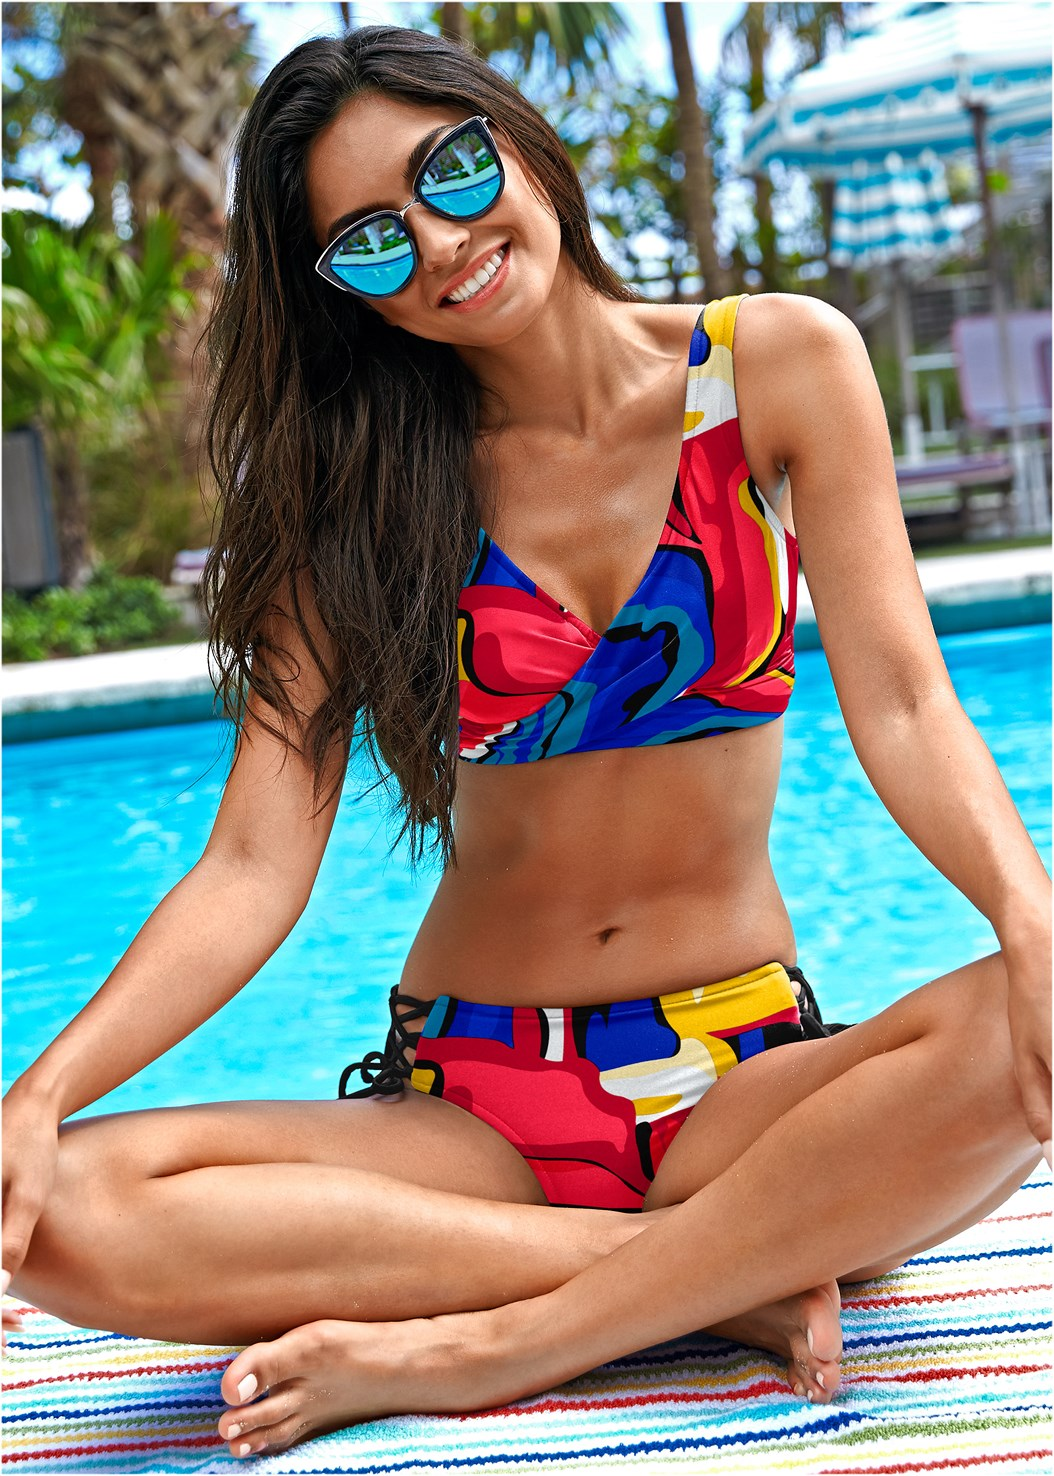 Lovely Lift Wrap Bikini Top,Lattice Side Bikini Bottom,Scoop Front Classic Bikini Bottom ,Ruched Waist Bikini Bottom,Low Rise Classic Bikini Bottom